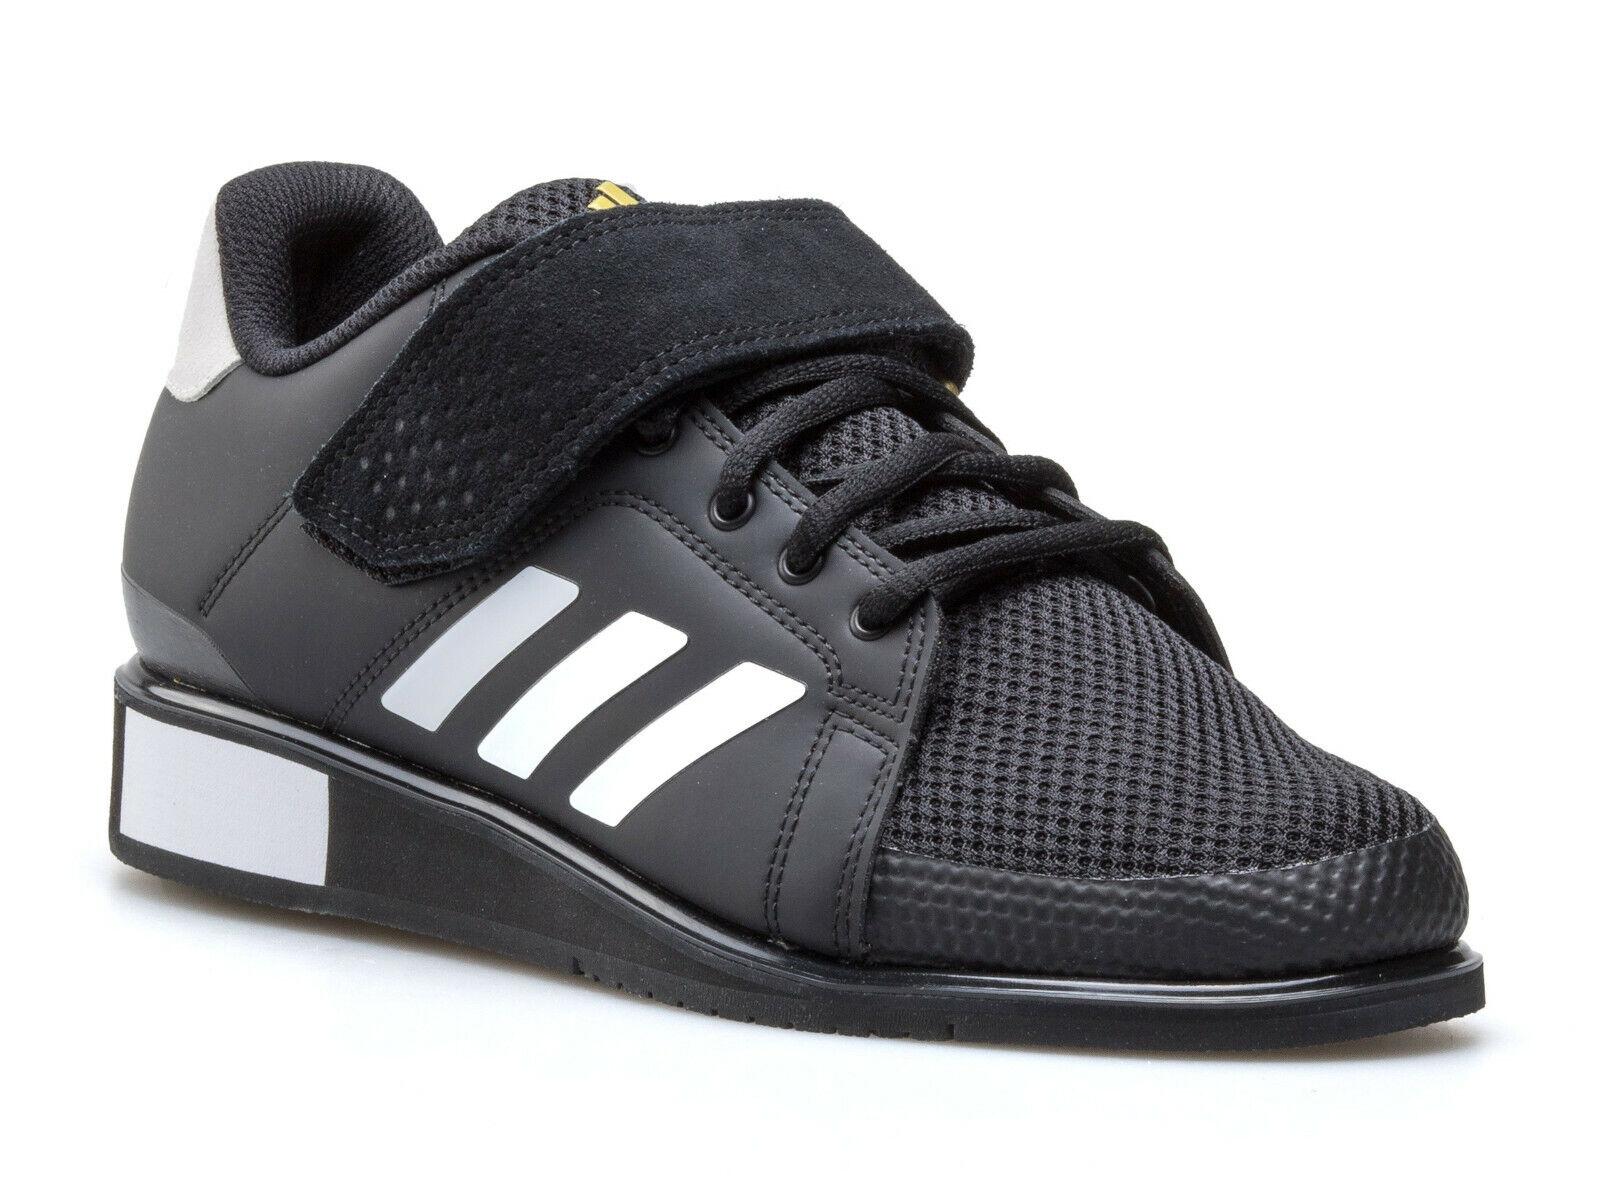 Adidas Power Perfect 3 BB6363 Zapatos de levantamiento de pesas para hombre